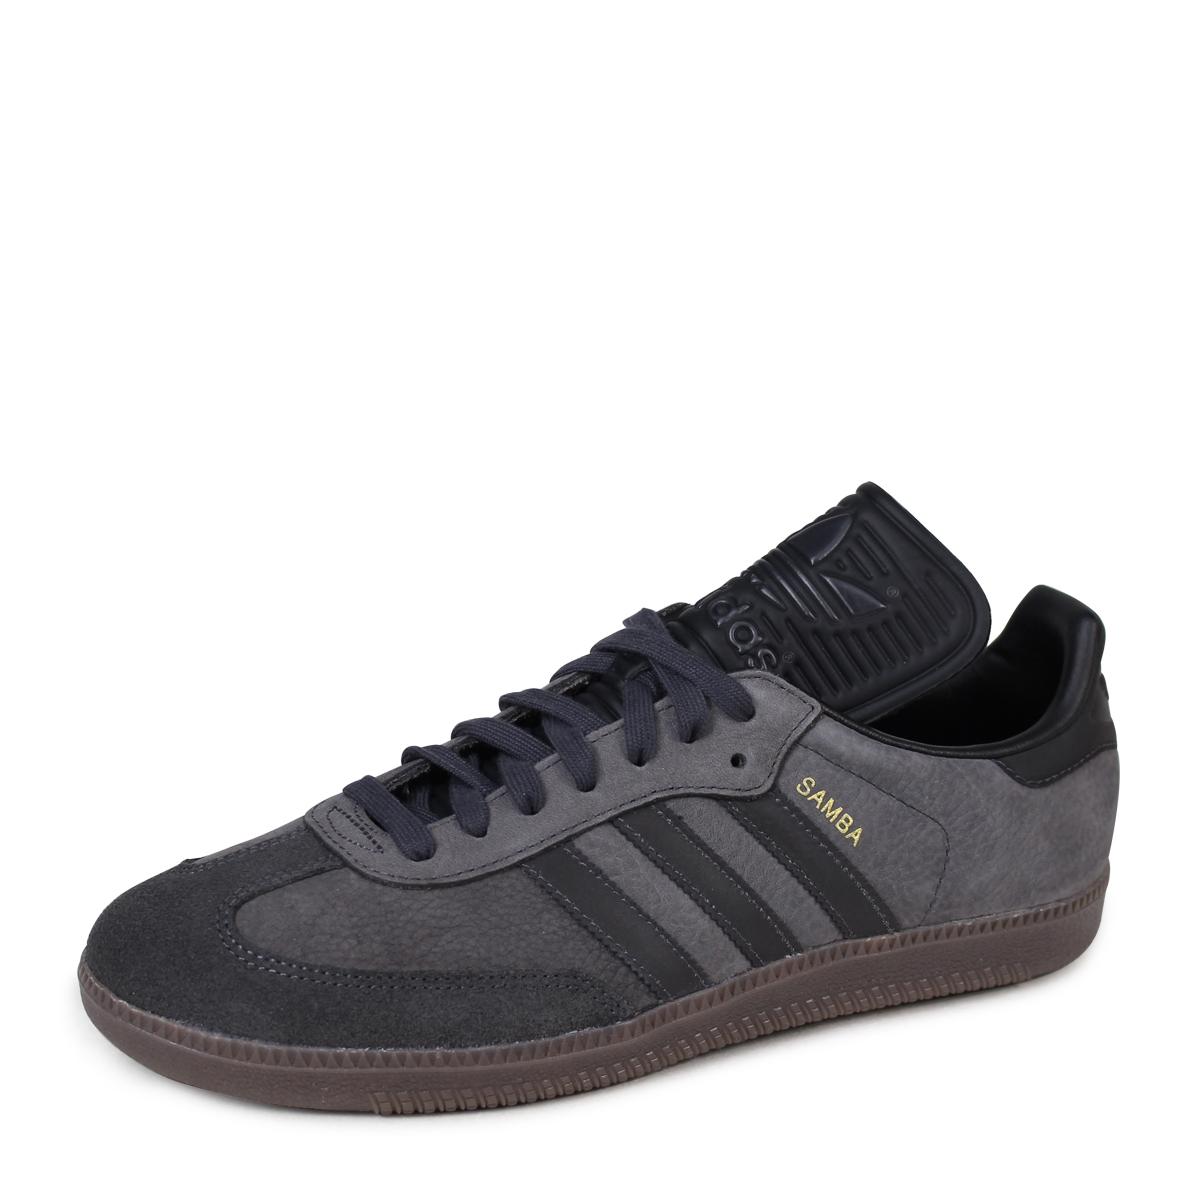 86fa89a5b87 adidas Originals SAMBA CLASSIC OG Adidas samba sneakers men BZ0227 black  originals  load planned Shinnyu load in reservation product 3 20 containing    183